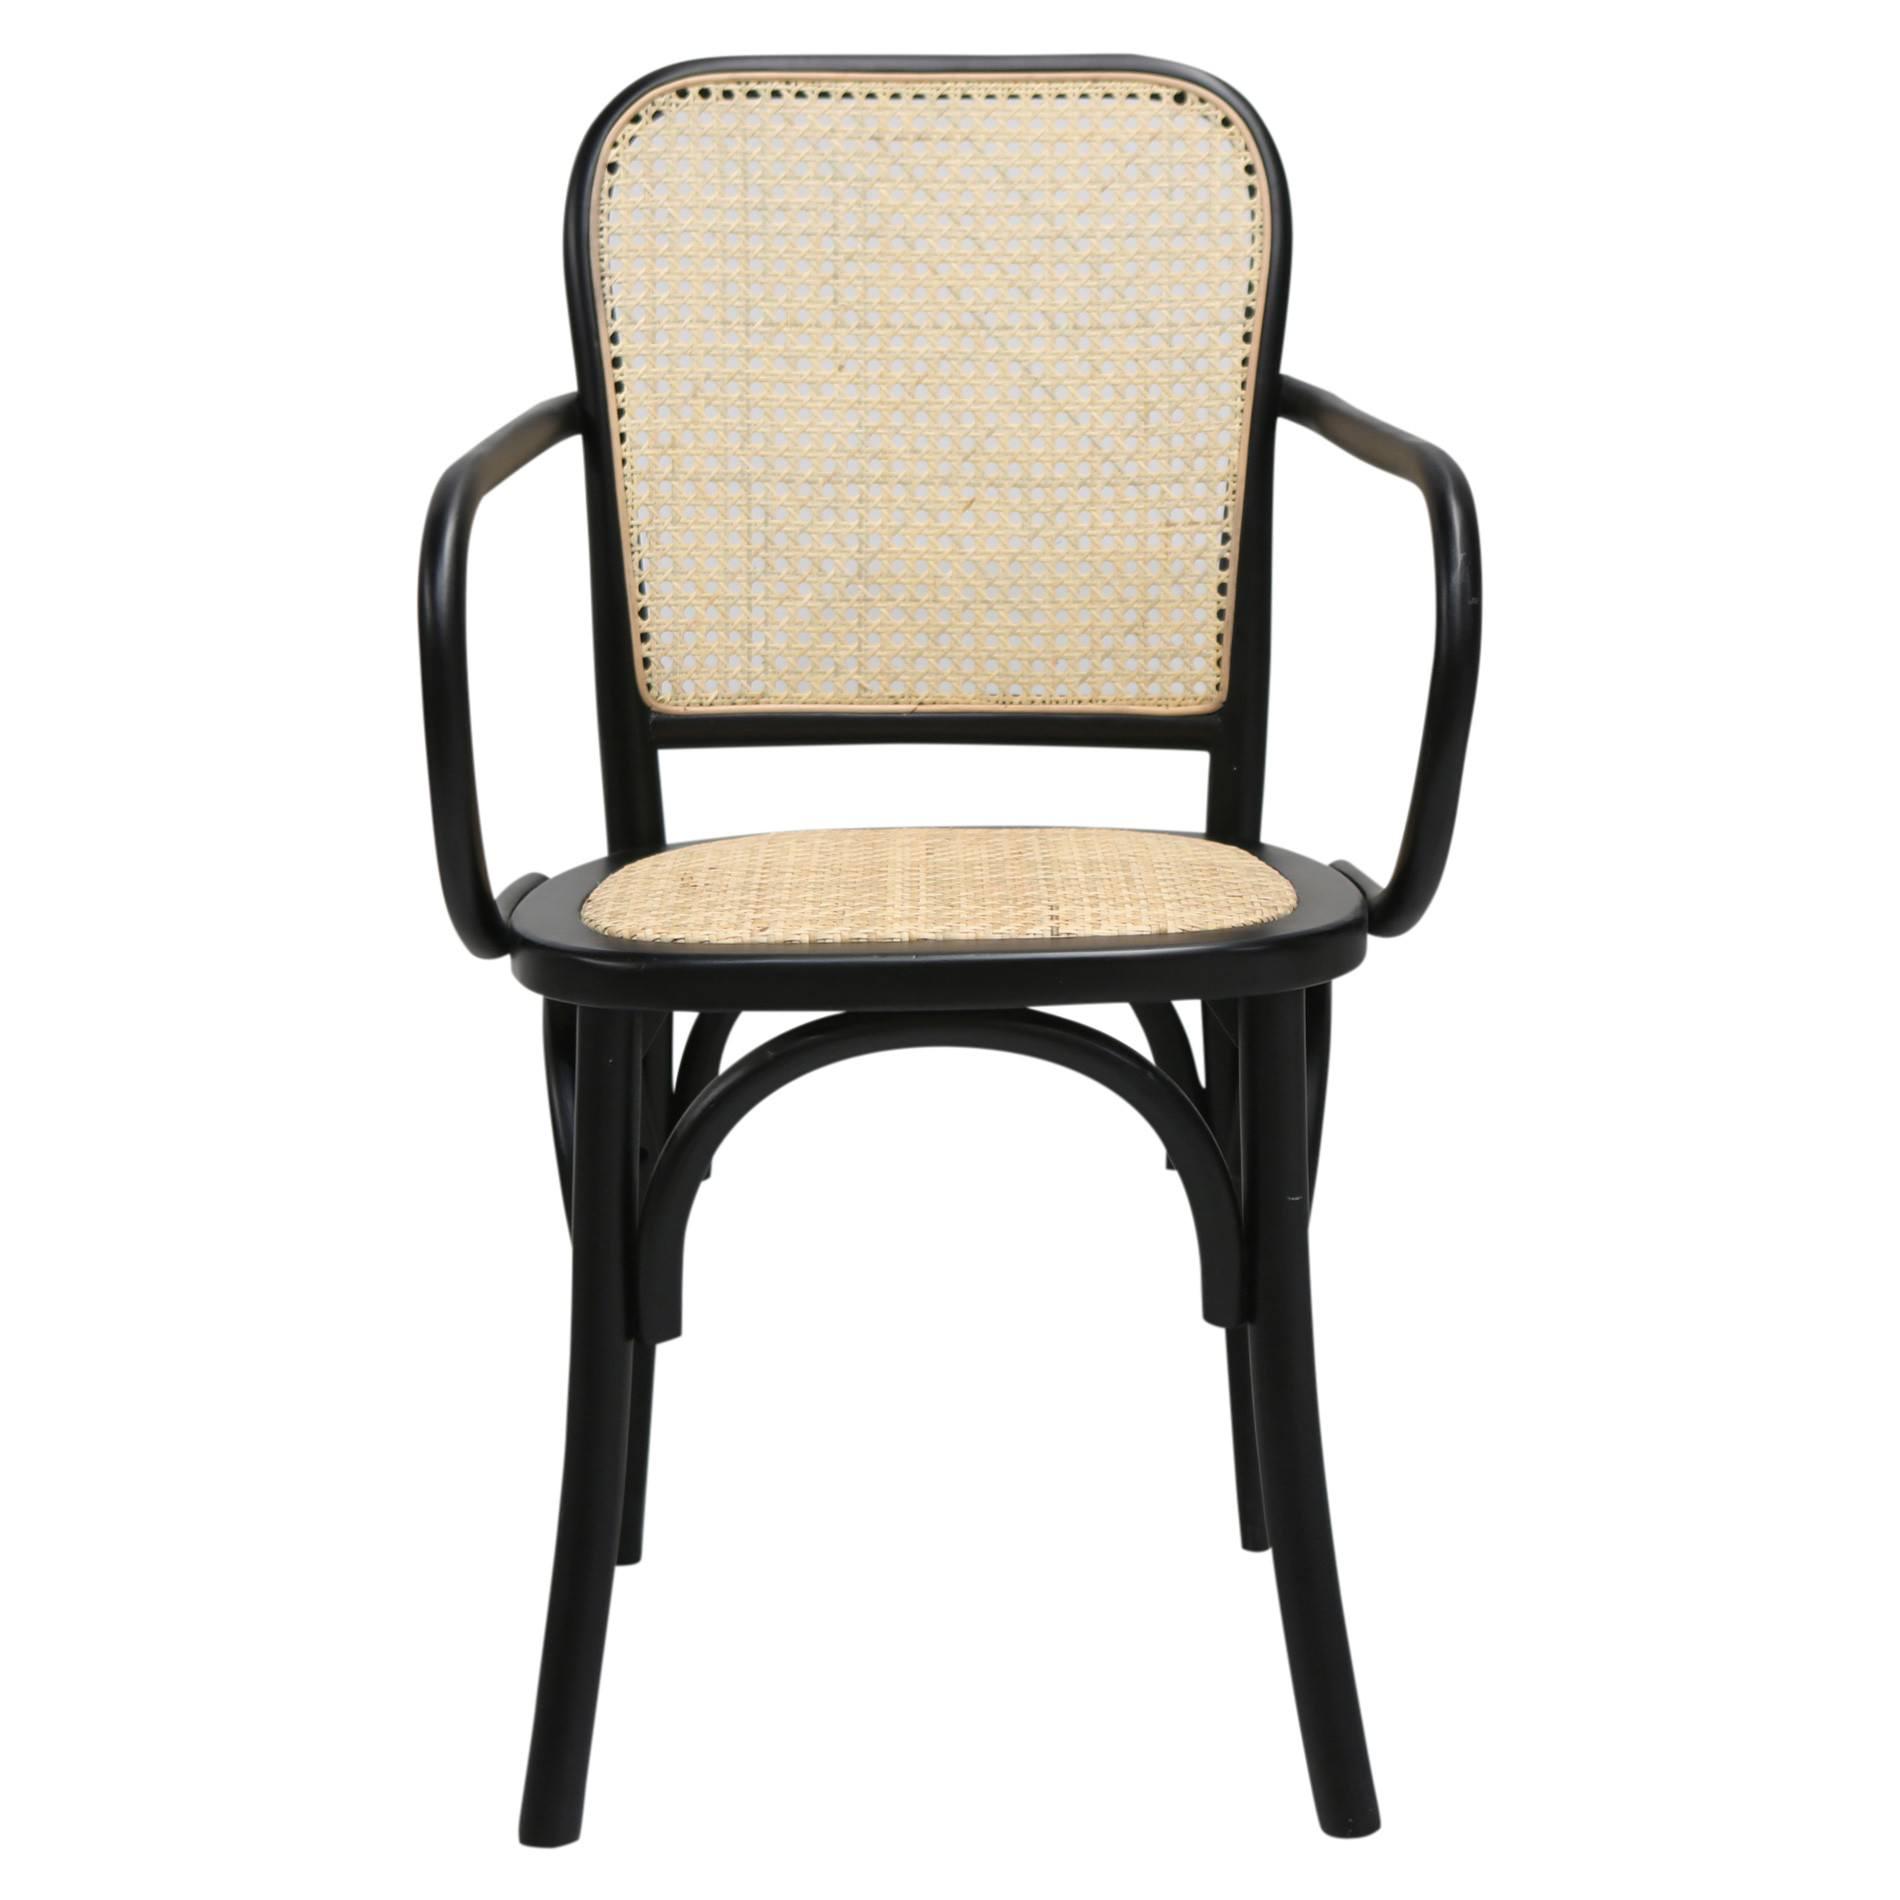 Cato Beech Timber & Rattan Dining Armchair, Black